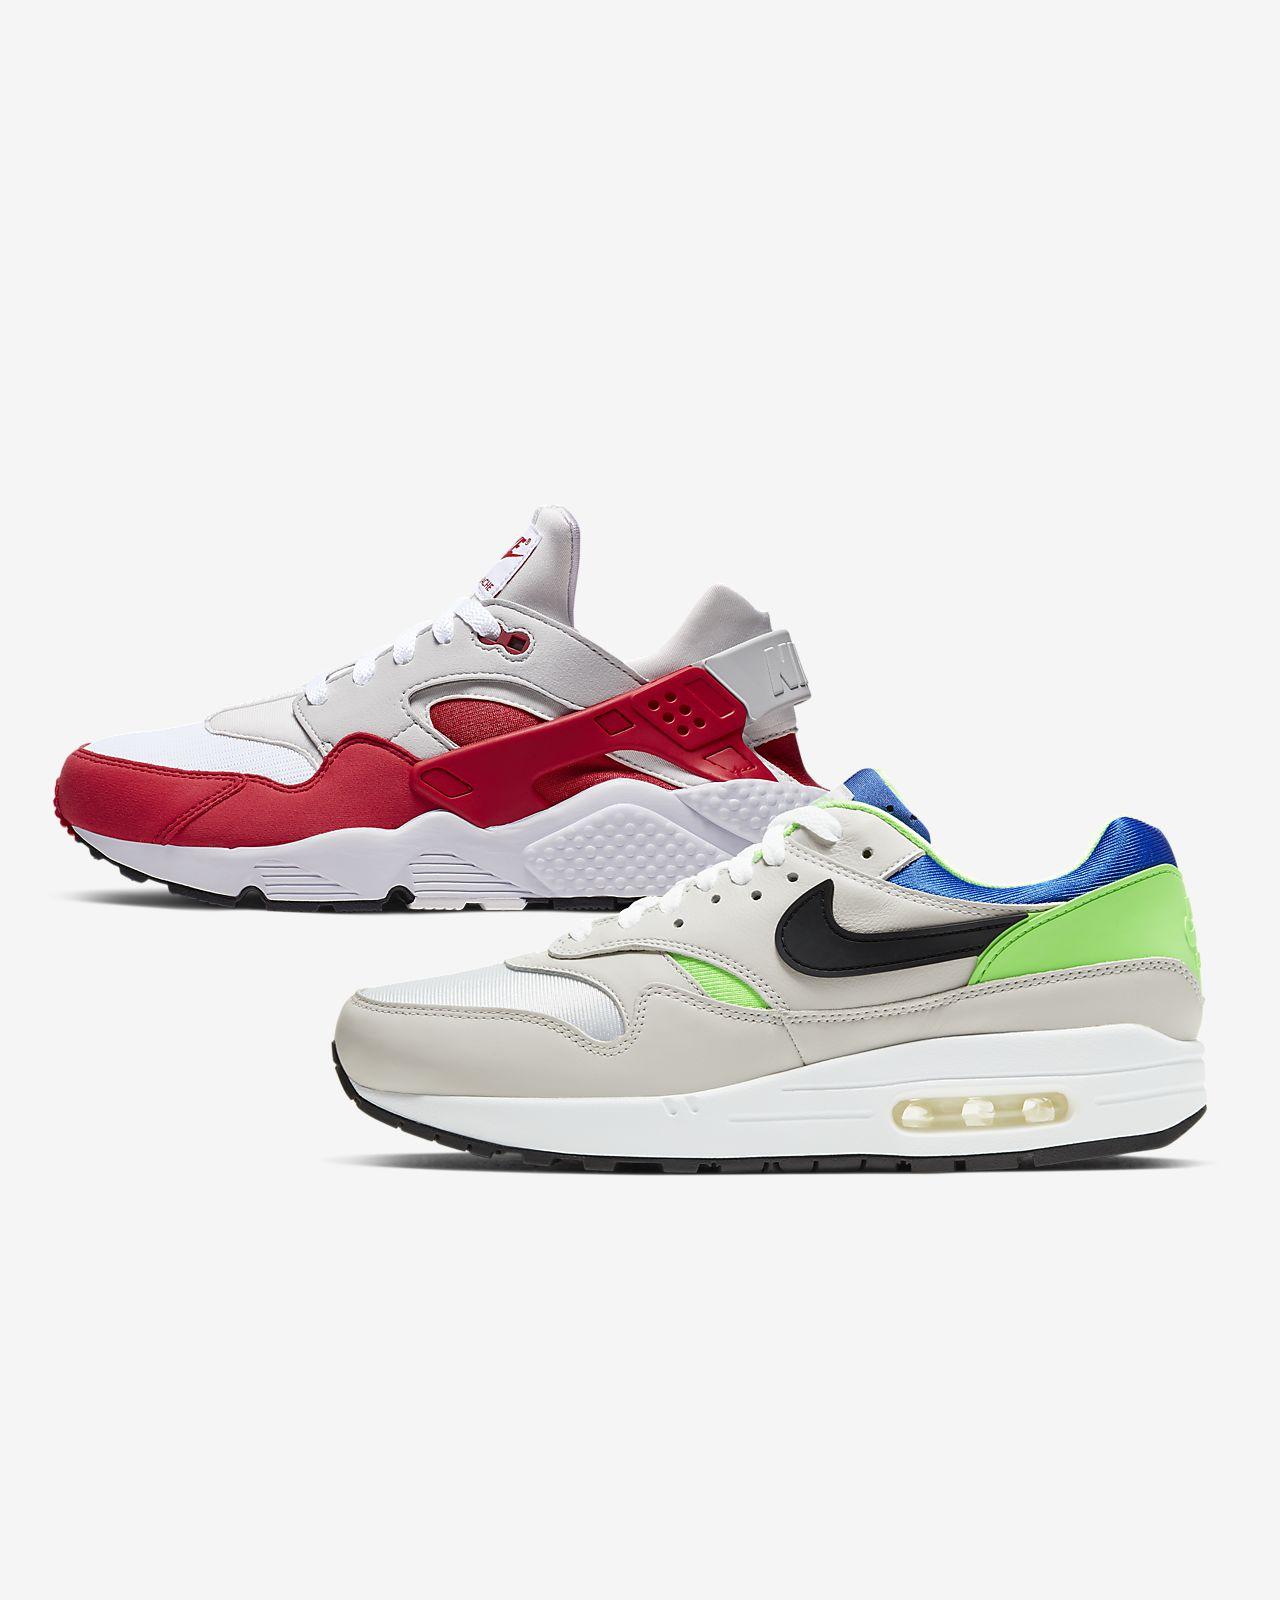 Nike DNA Series '87 x '91 Men's Shoes